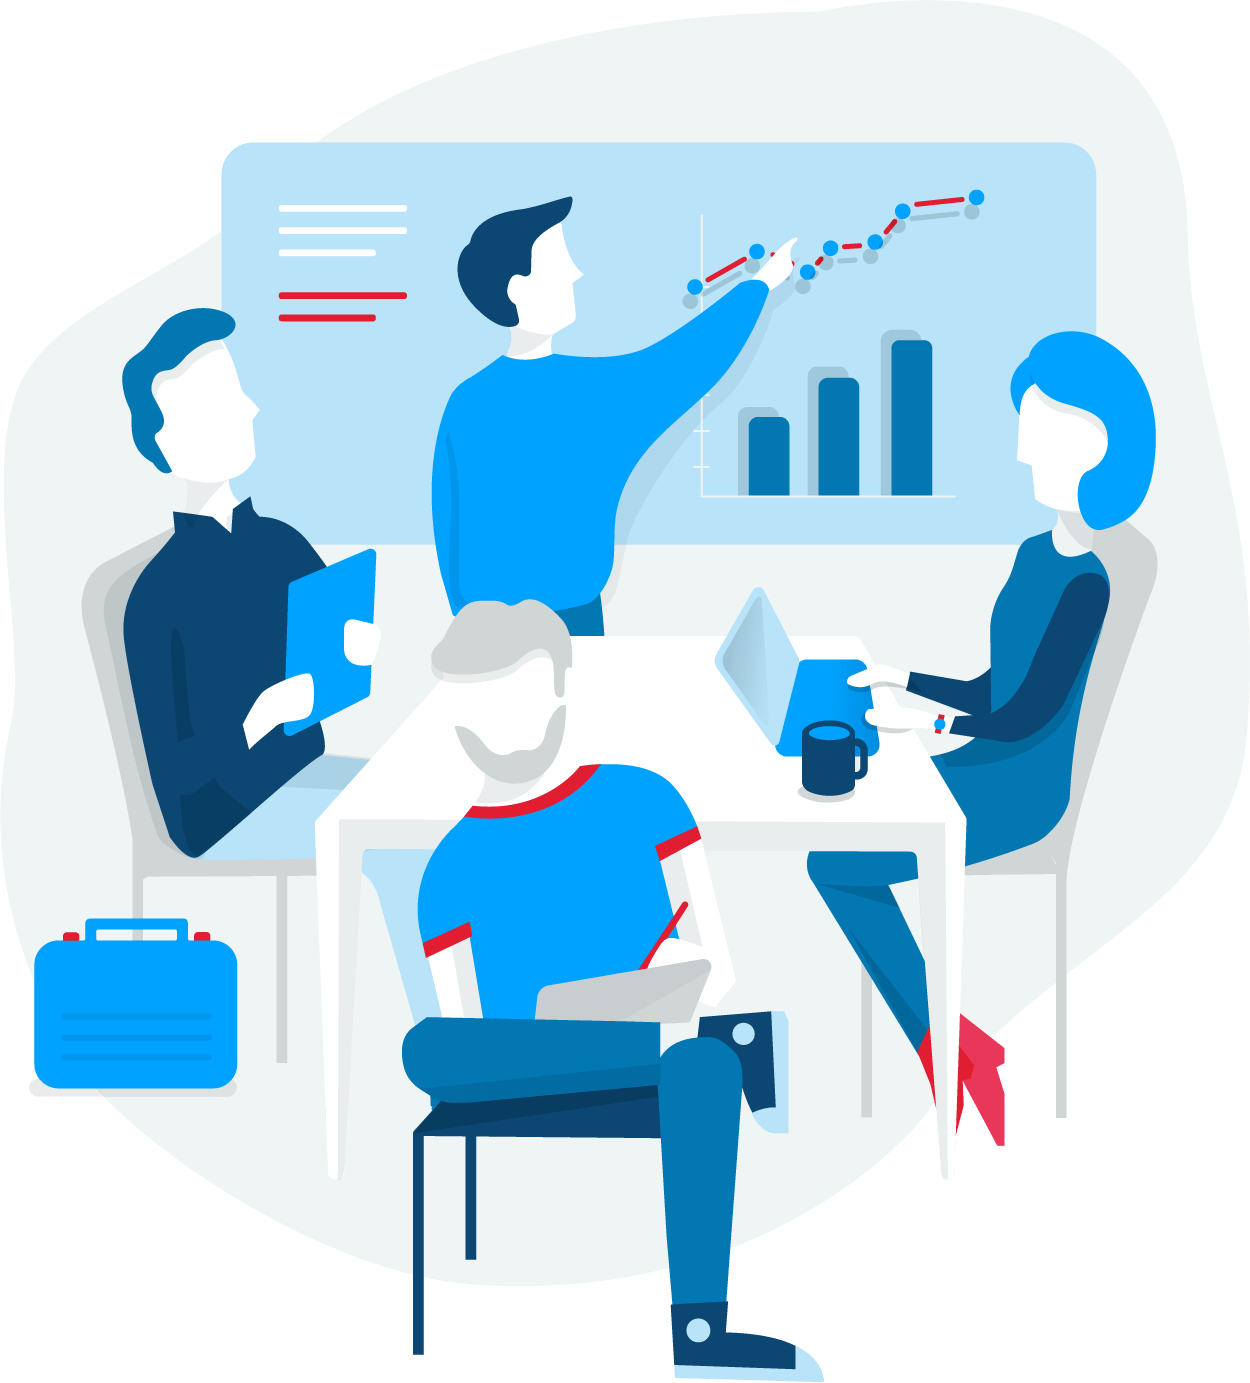 Collaboration clipart secondary group. Range digital marketing agency